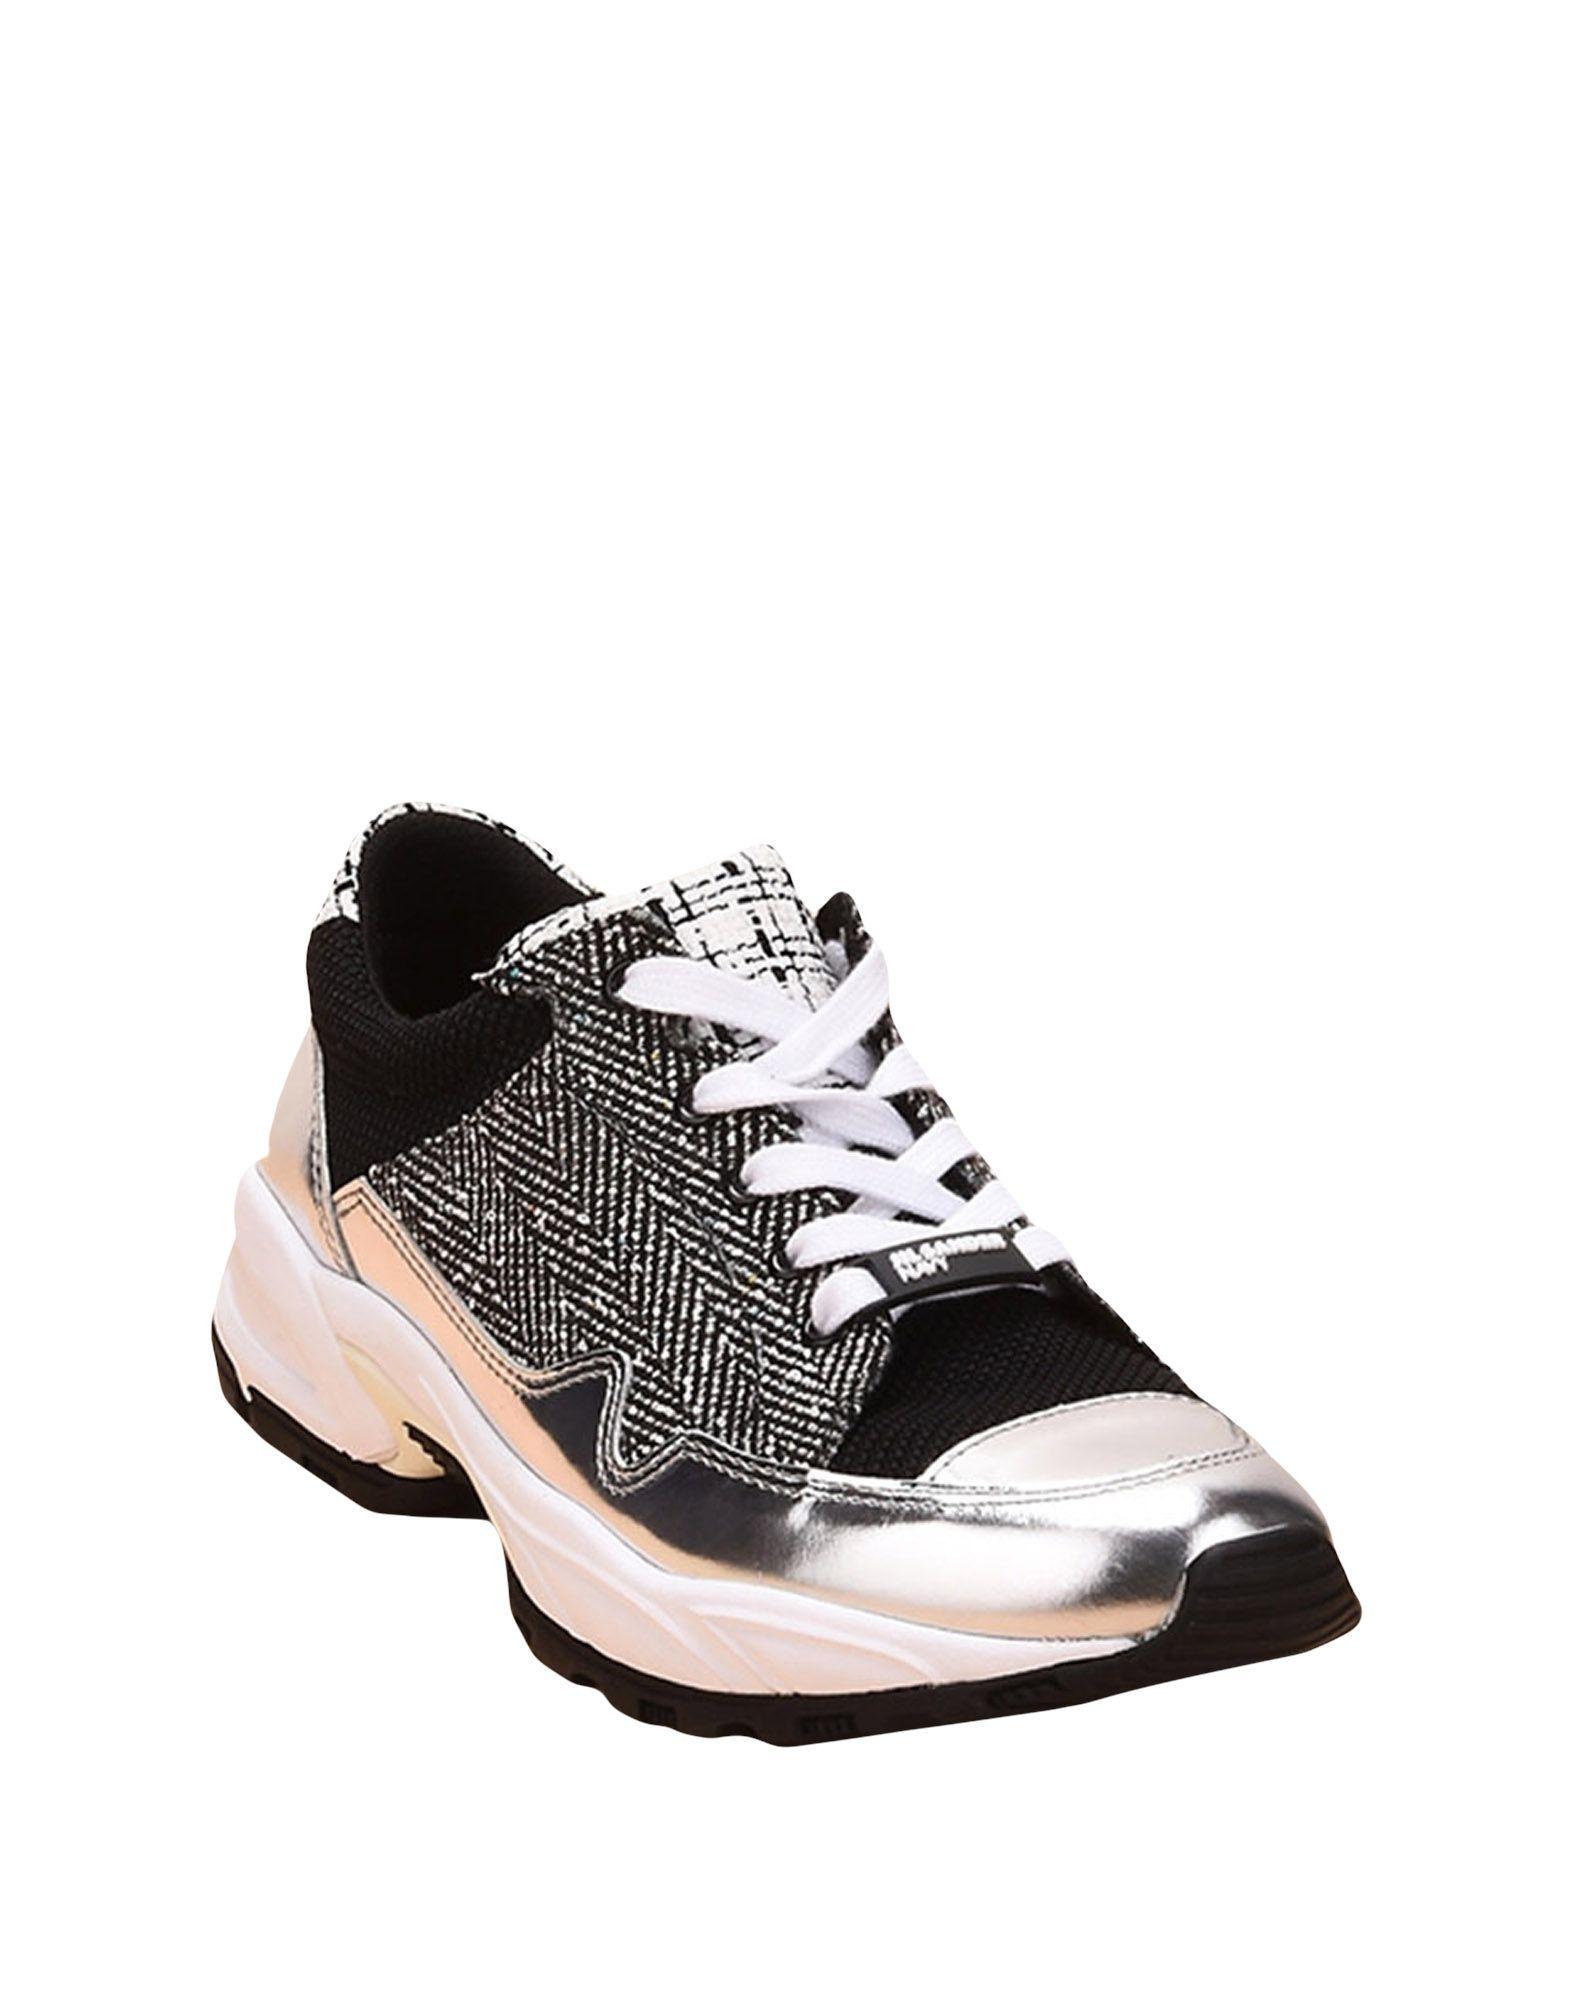 JIL SANDER NAVY Низкие кеды и кроссовки кеды кроссовки высокие женские dc rebound high tx navy gum